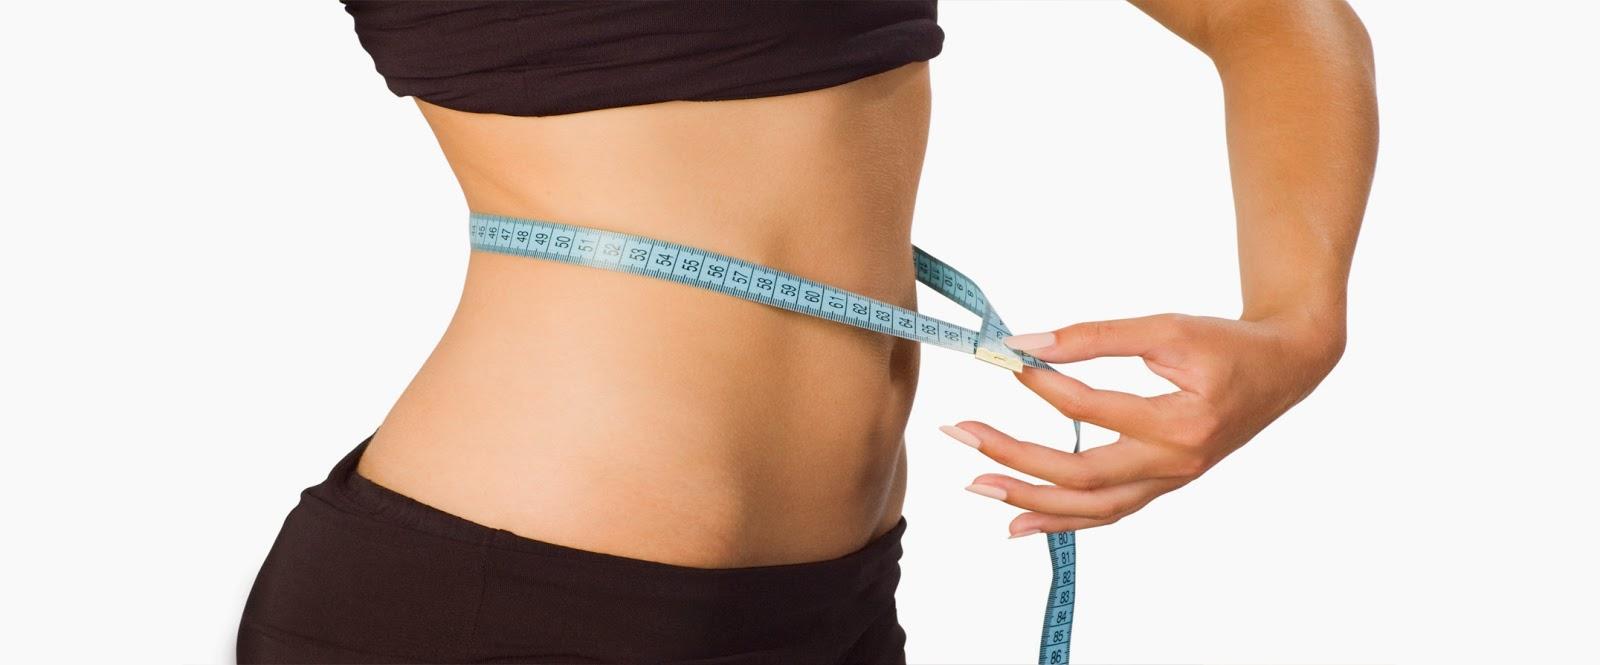 Menu plan to lose belly fat photo 8